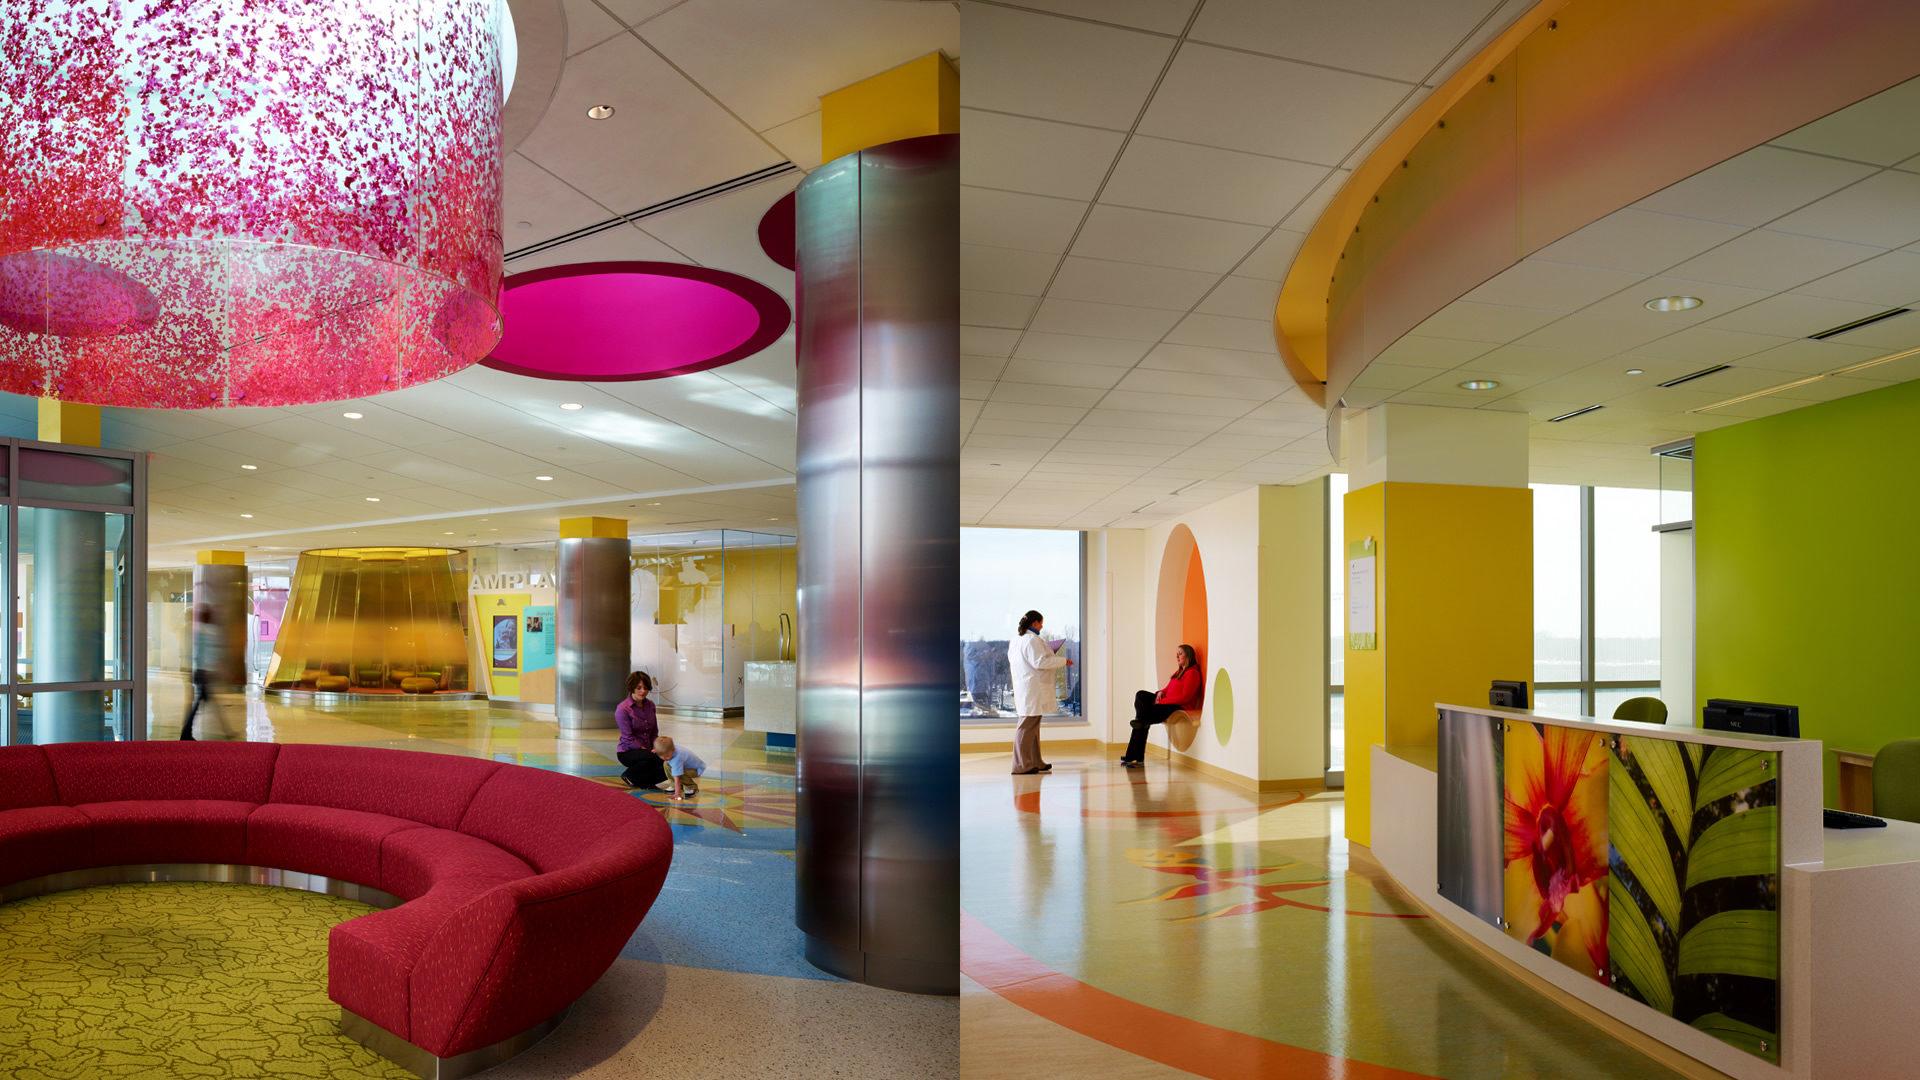 U of M Masonic Childrens Hospital Amplatz Interior Lobby at Entrance and Corridor with Information Desk